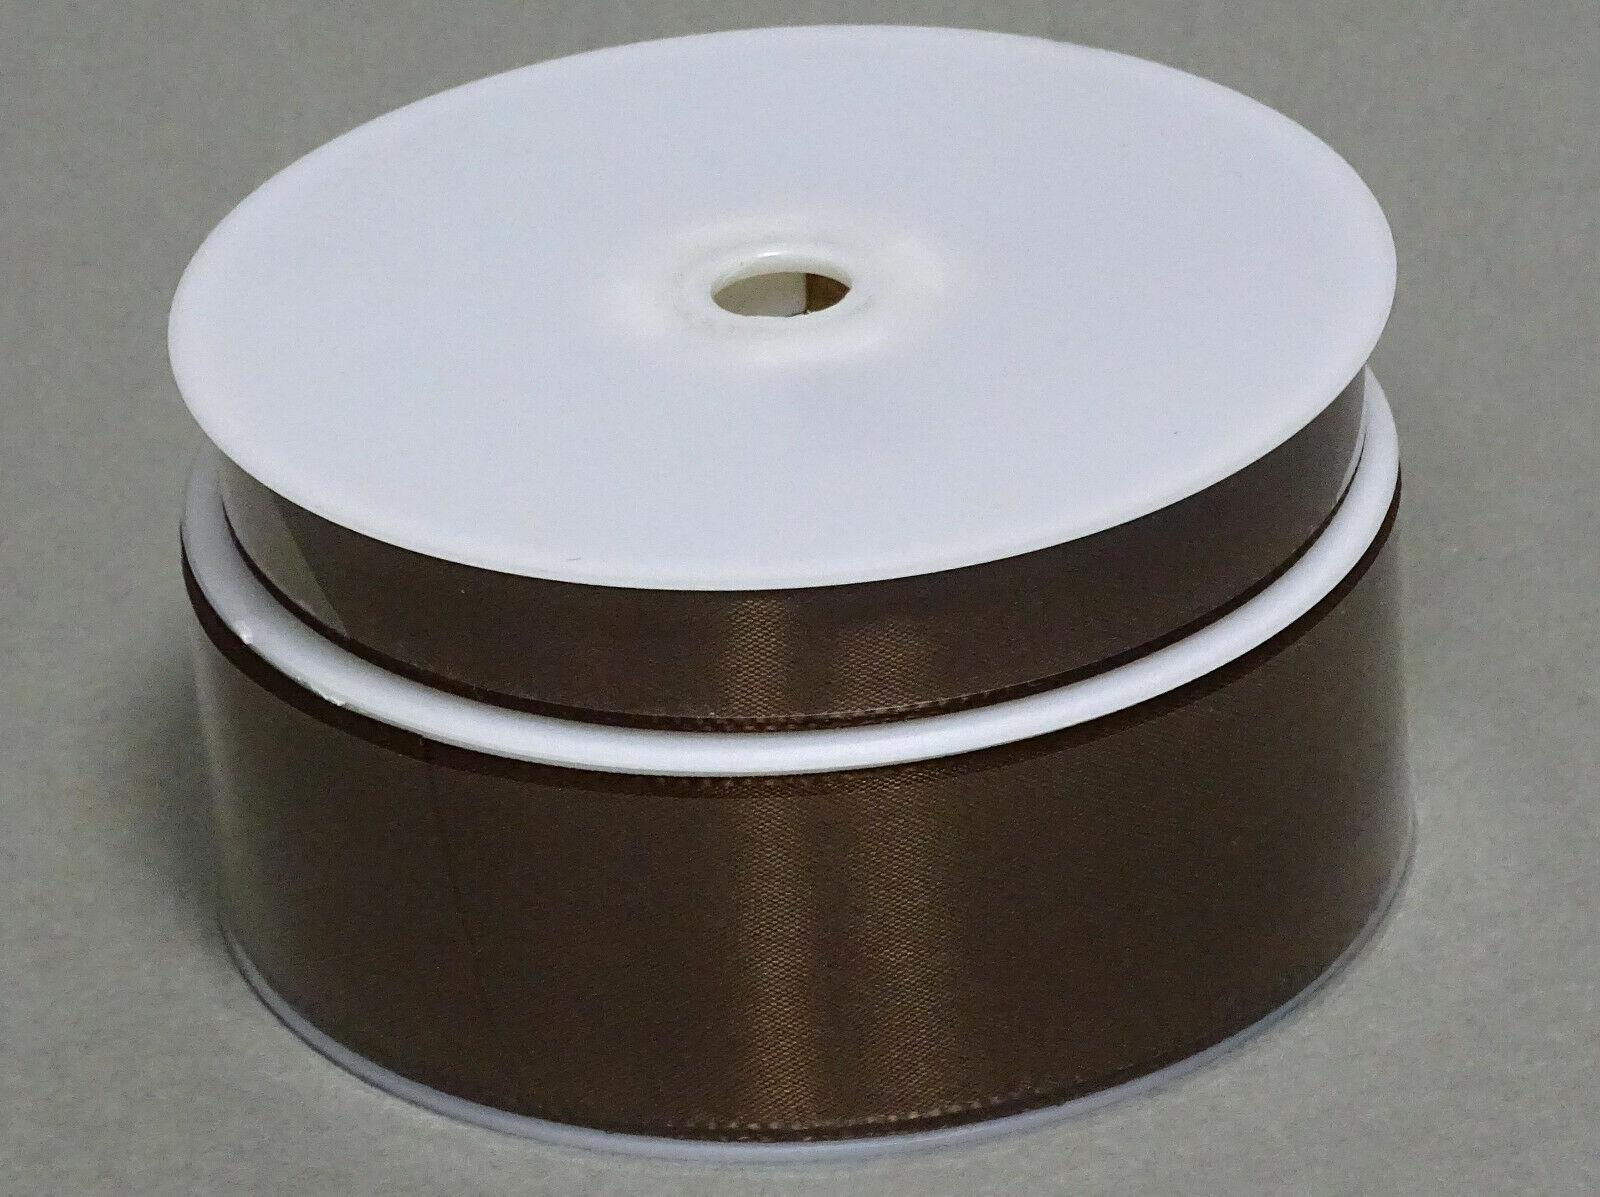 Seidenband Schleifenband 50 m x 15 / 25 / 40mm Dekoband ab 0,08€/m Geschenkband  - Braun 132, 40 mm x 50 m